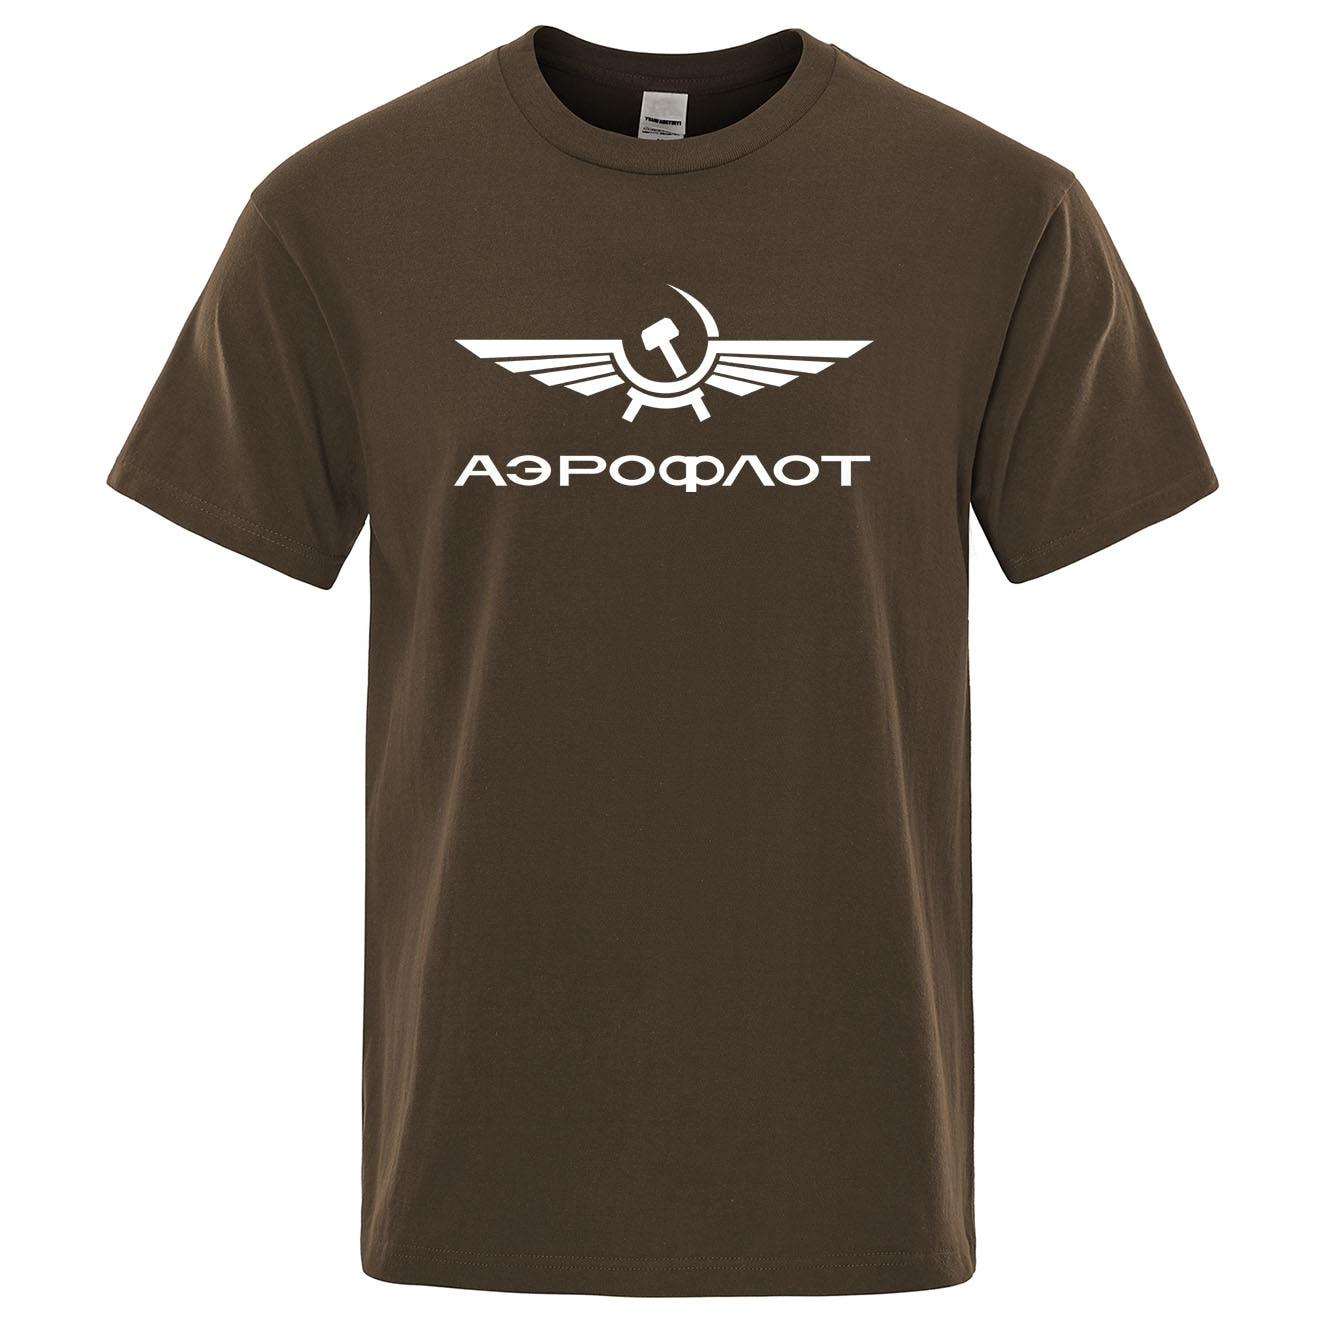 Aeroflot Aviation Russe Pilote Aerospace Aviateur   T  -  Shirt   Summer Cotton Short Sleeve Fashion Tops O-Neck Stylish Mens   T     shirt